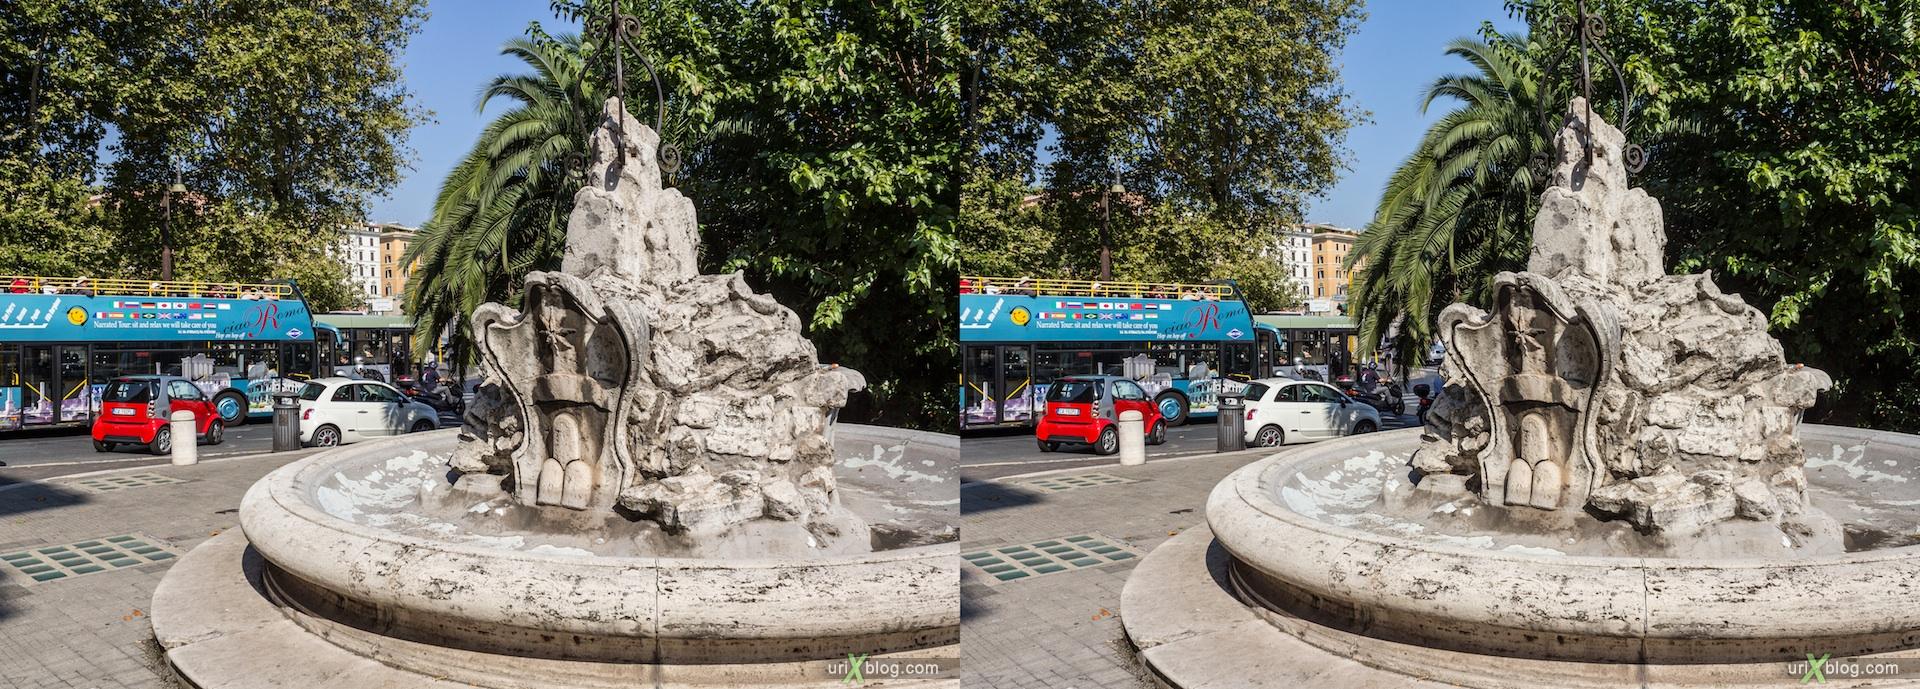 2012, фонтан dei Navigatori, площадь Piazza del Porto di Ripetta, Рим, Италия, осень, 3D, перекрёстные стереопары, стерео, стереопара, стереопары